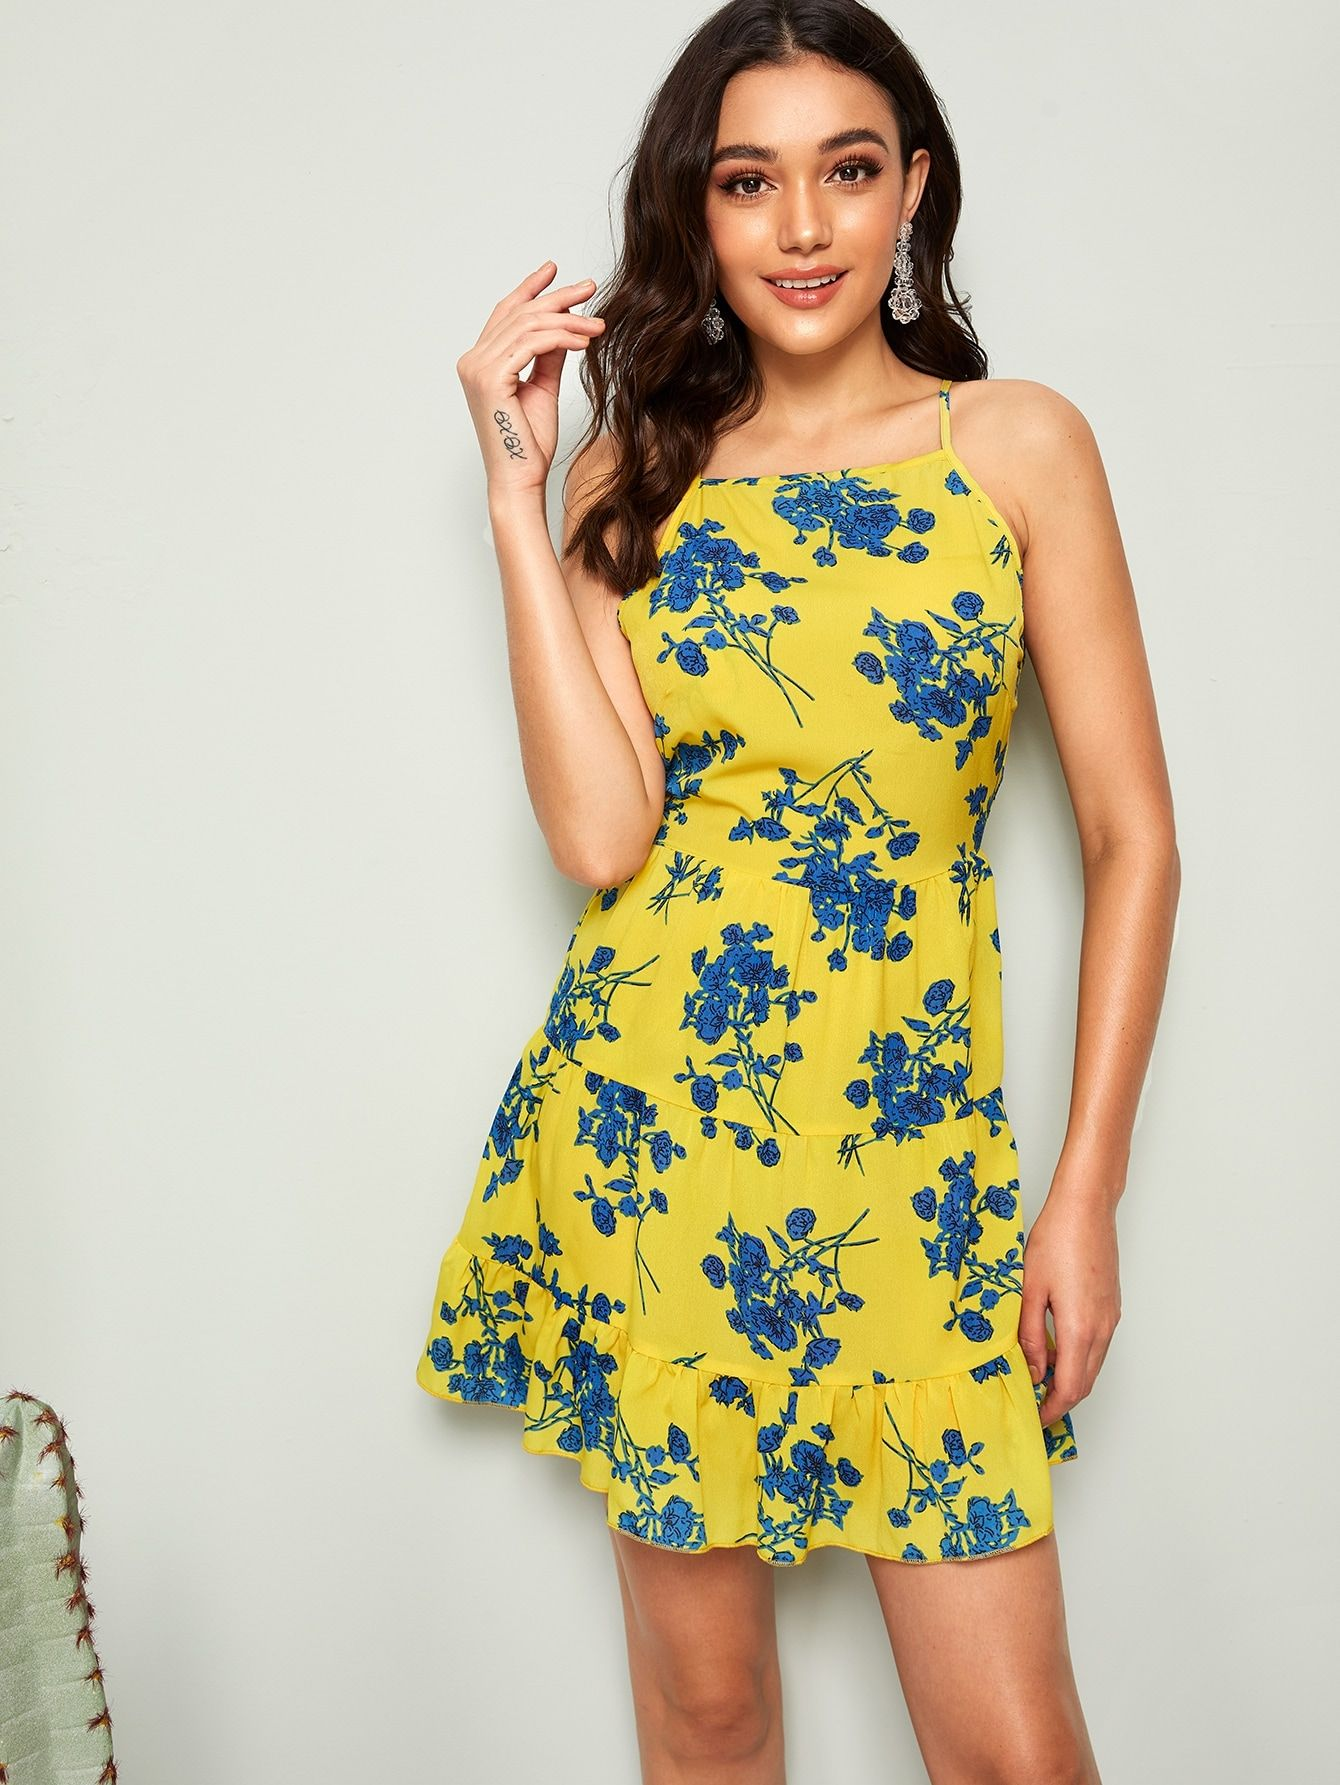 Plants Print Flippy Hem Sundress Ad Sponsored Print Plants Flippy Bright Fashion Fit And Flare Dress Sundress